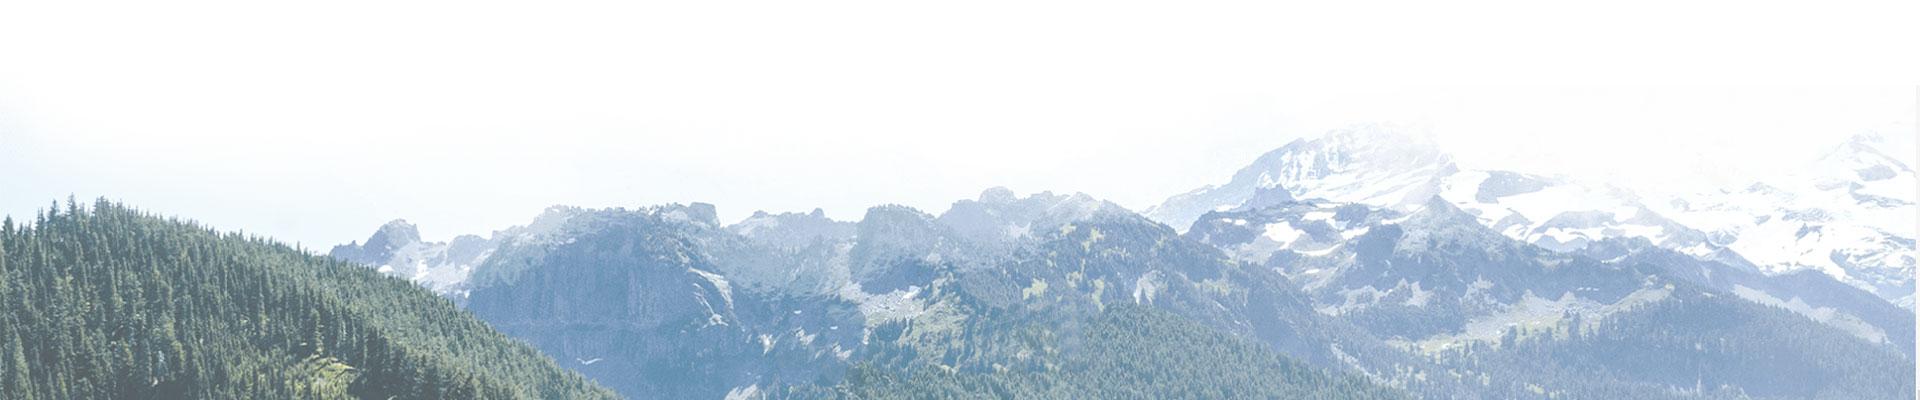 Illustration montagne haute savoie